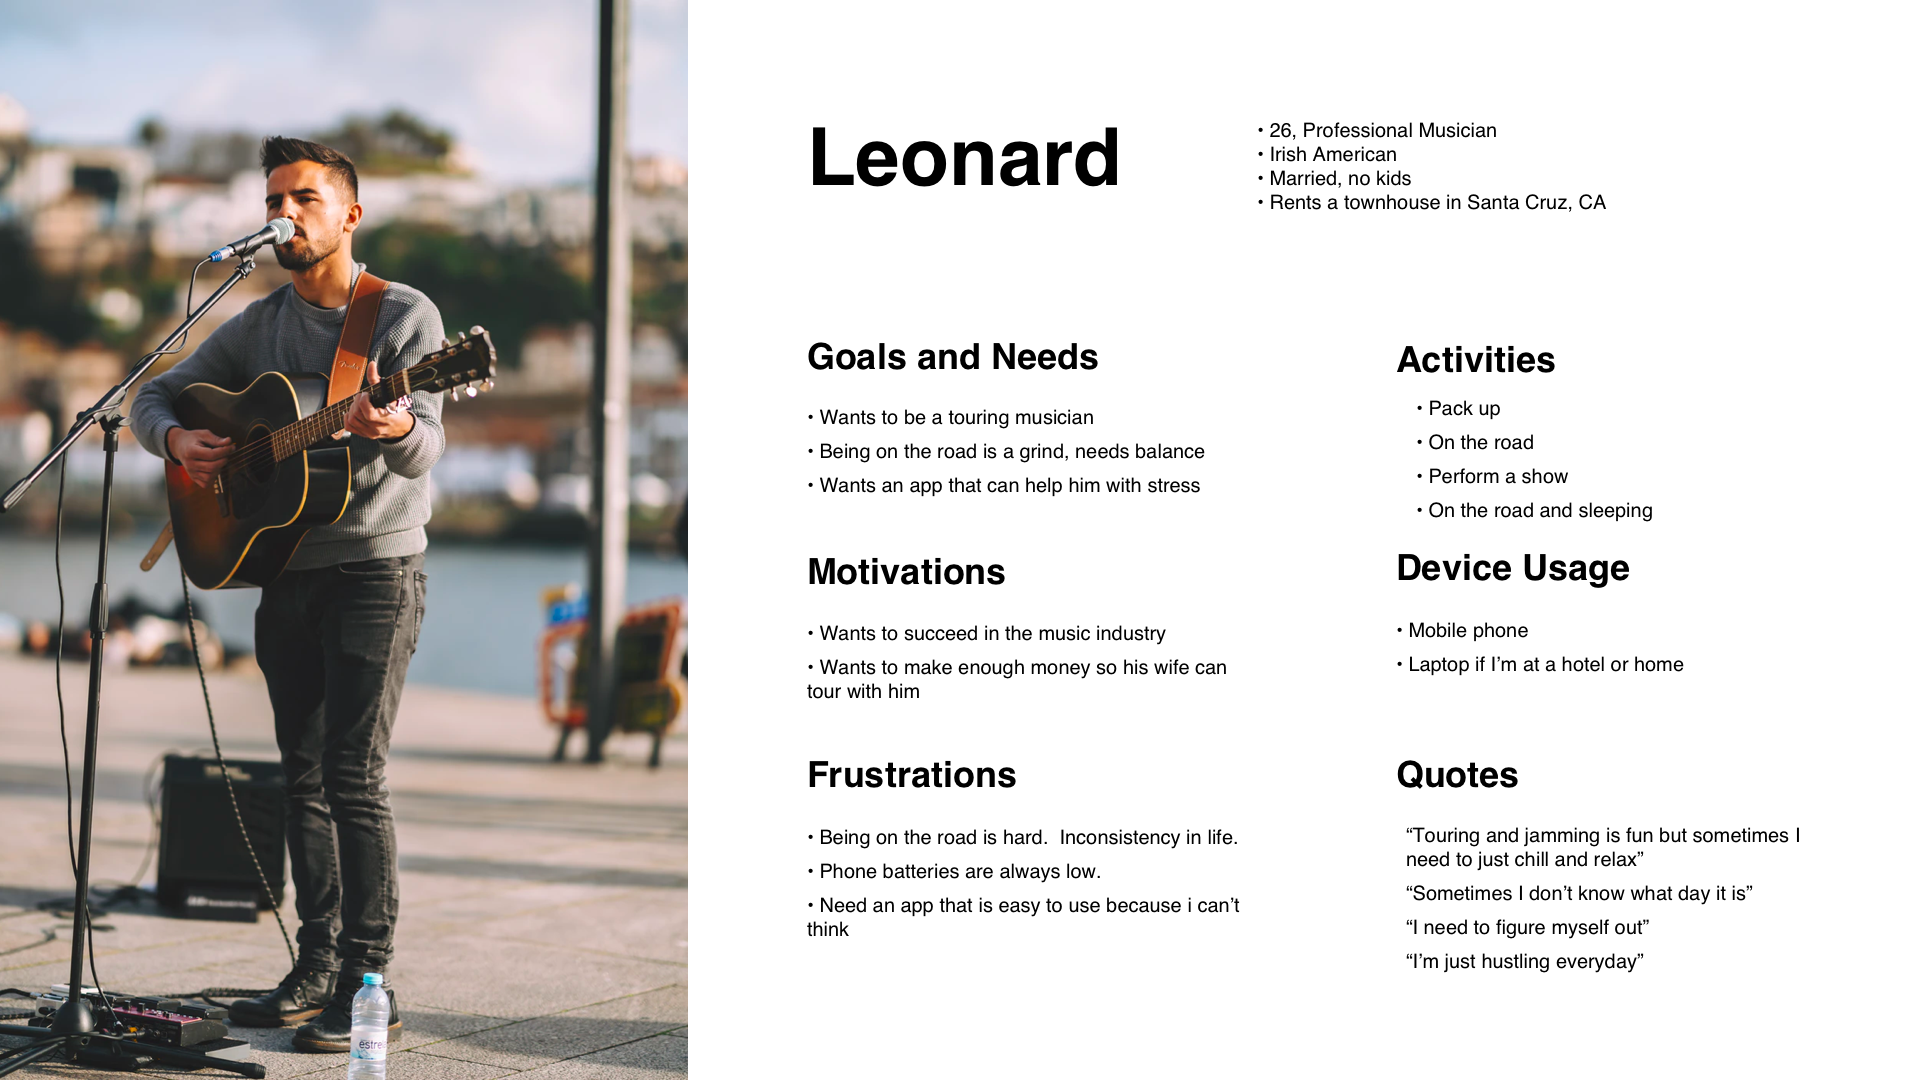 Persona 3 Leonard